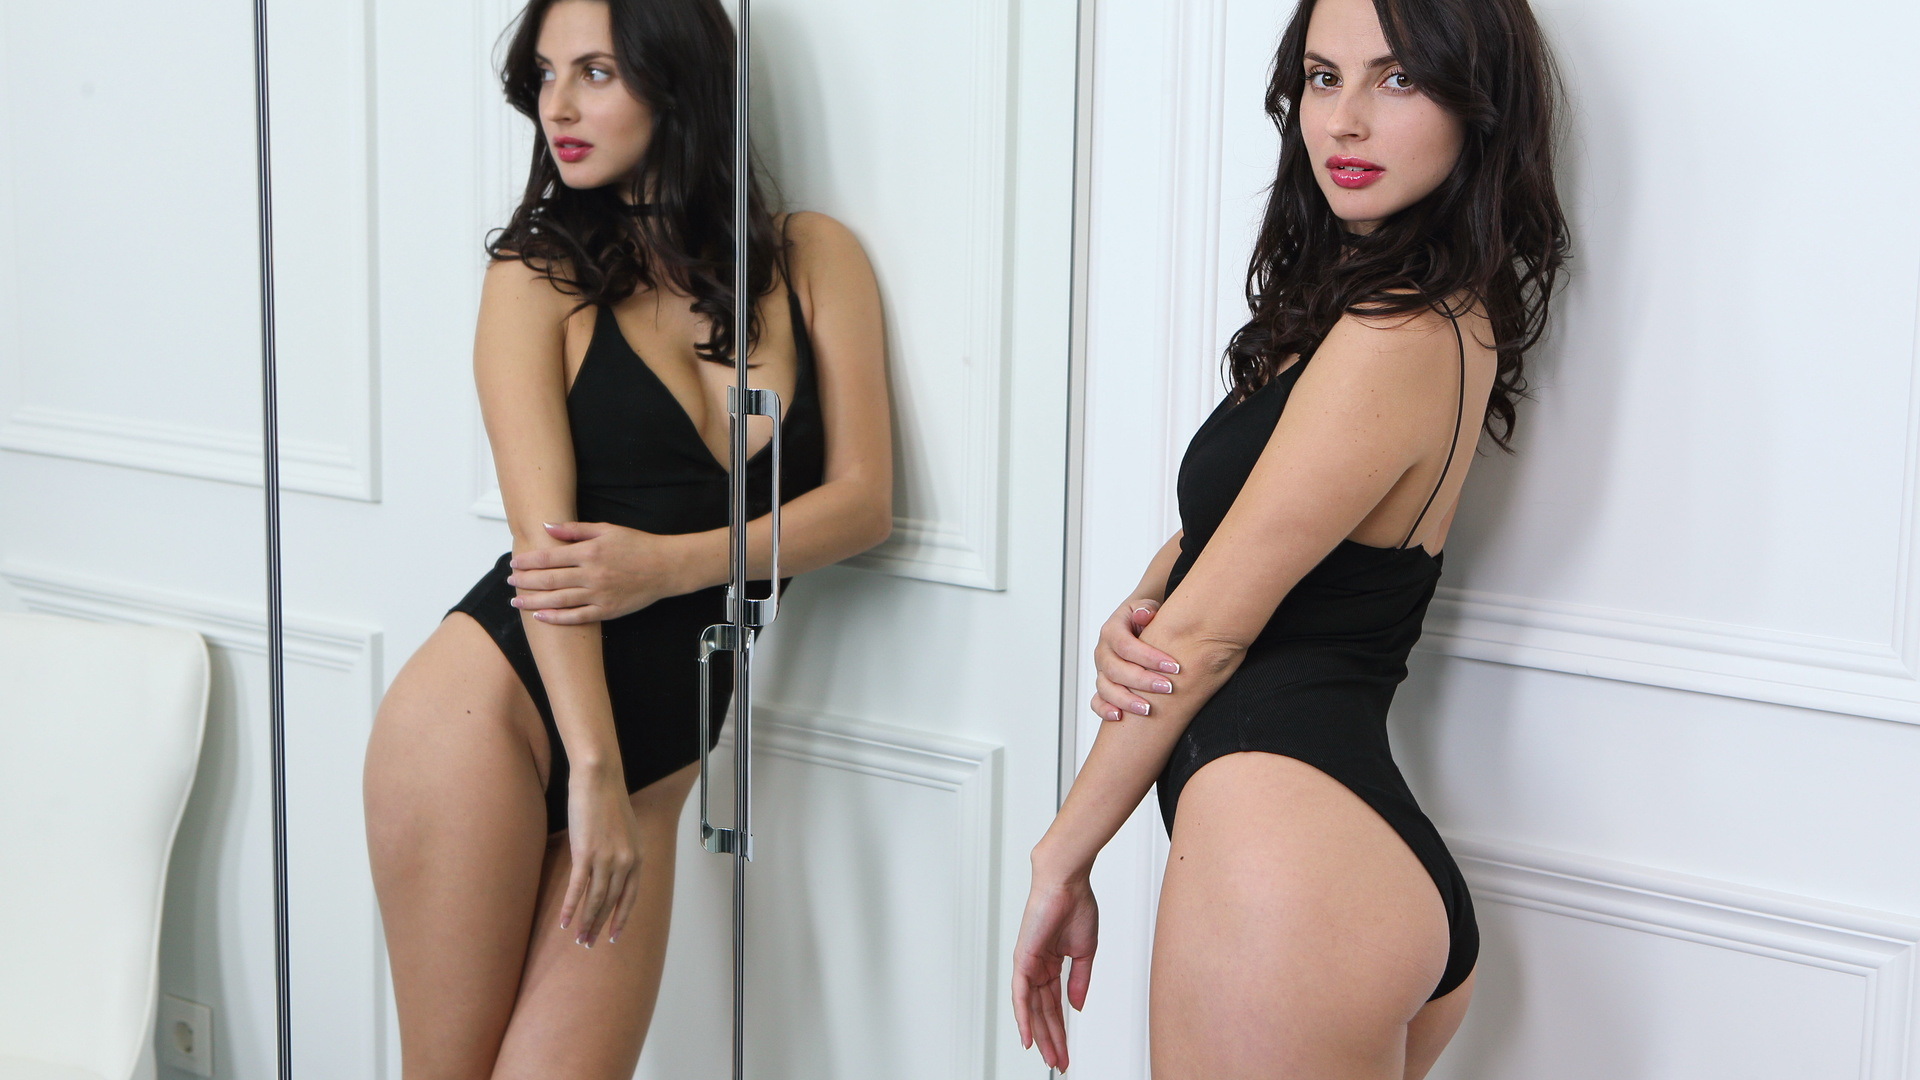 chica, belleza, modelo, pose, sexy.cuerpo, jasmine jazz